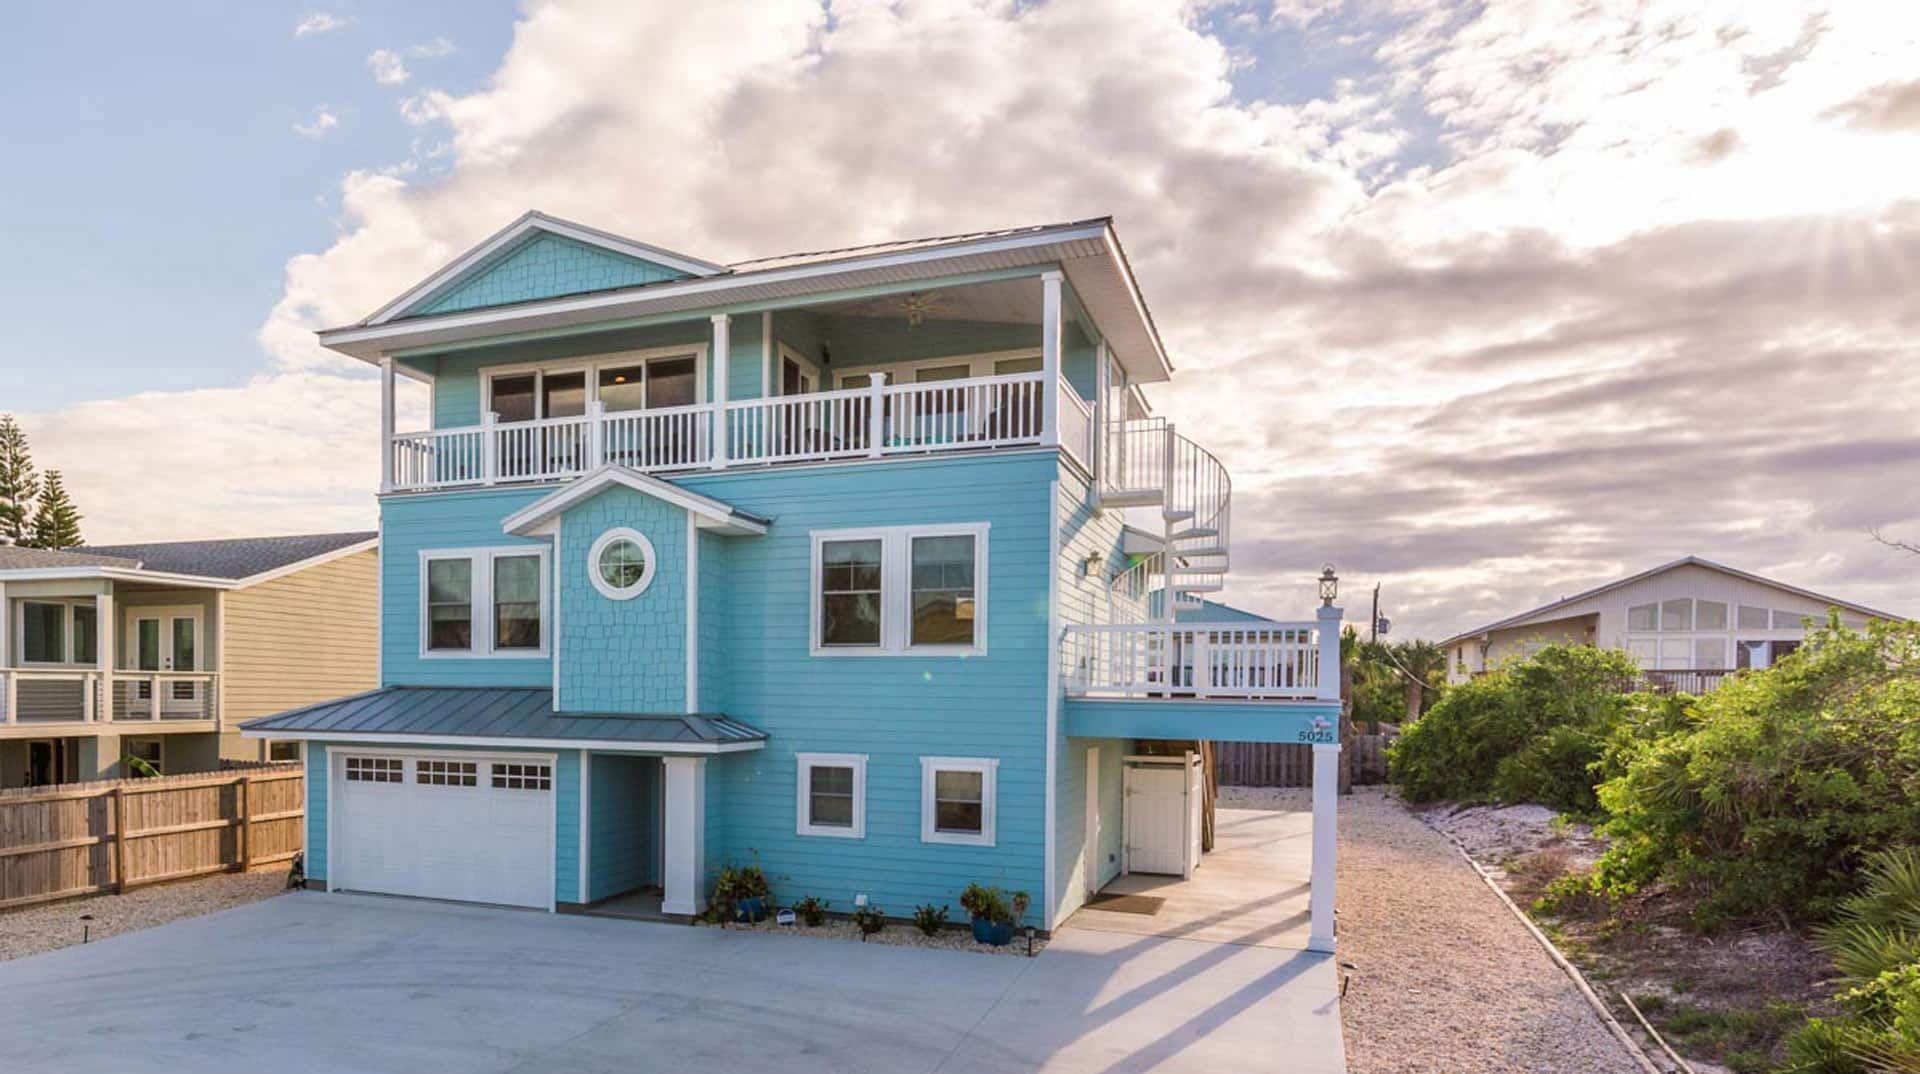 lower keys mortgage, lower florida keys mortgage, mortgage lower keys, second home loan, second home mortgage